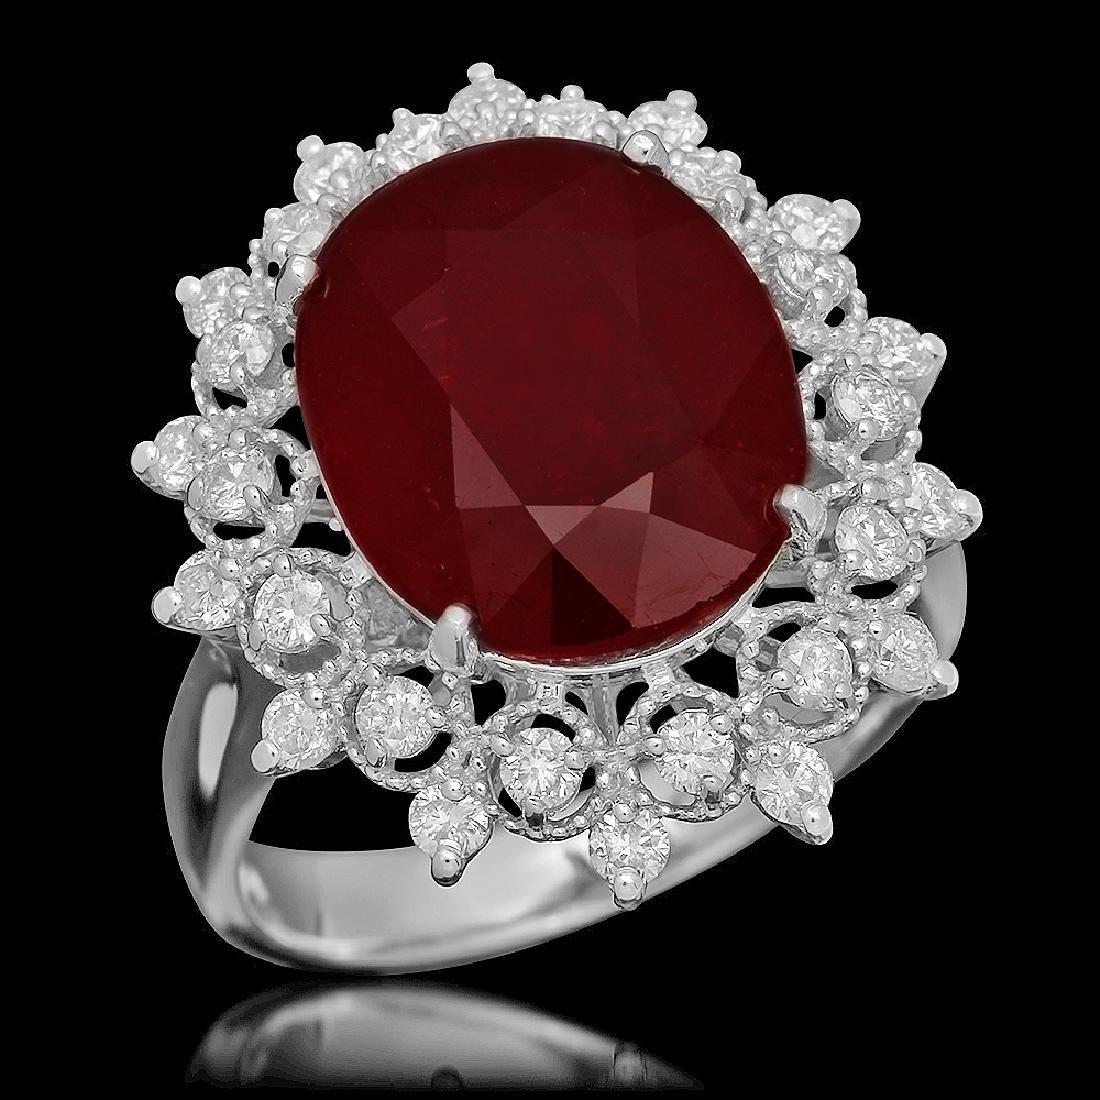 14K Gold 6.06ct Ruby 0.71ct Diamond Ring